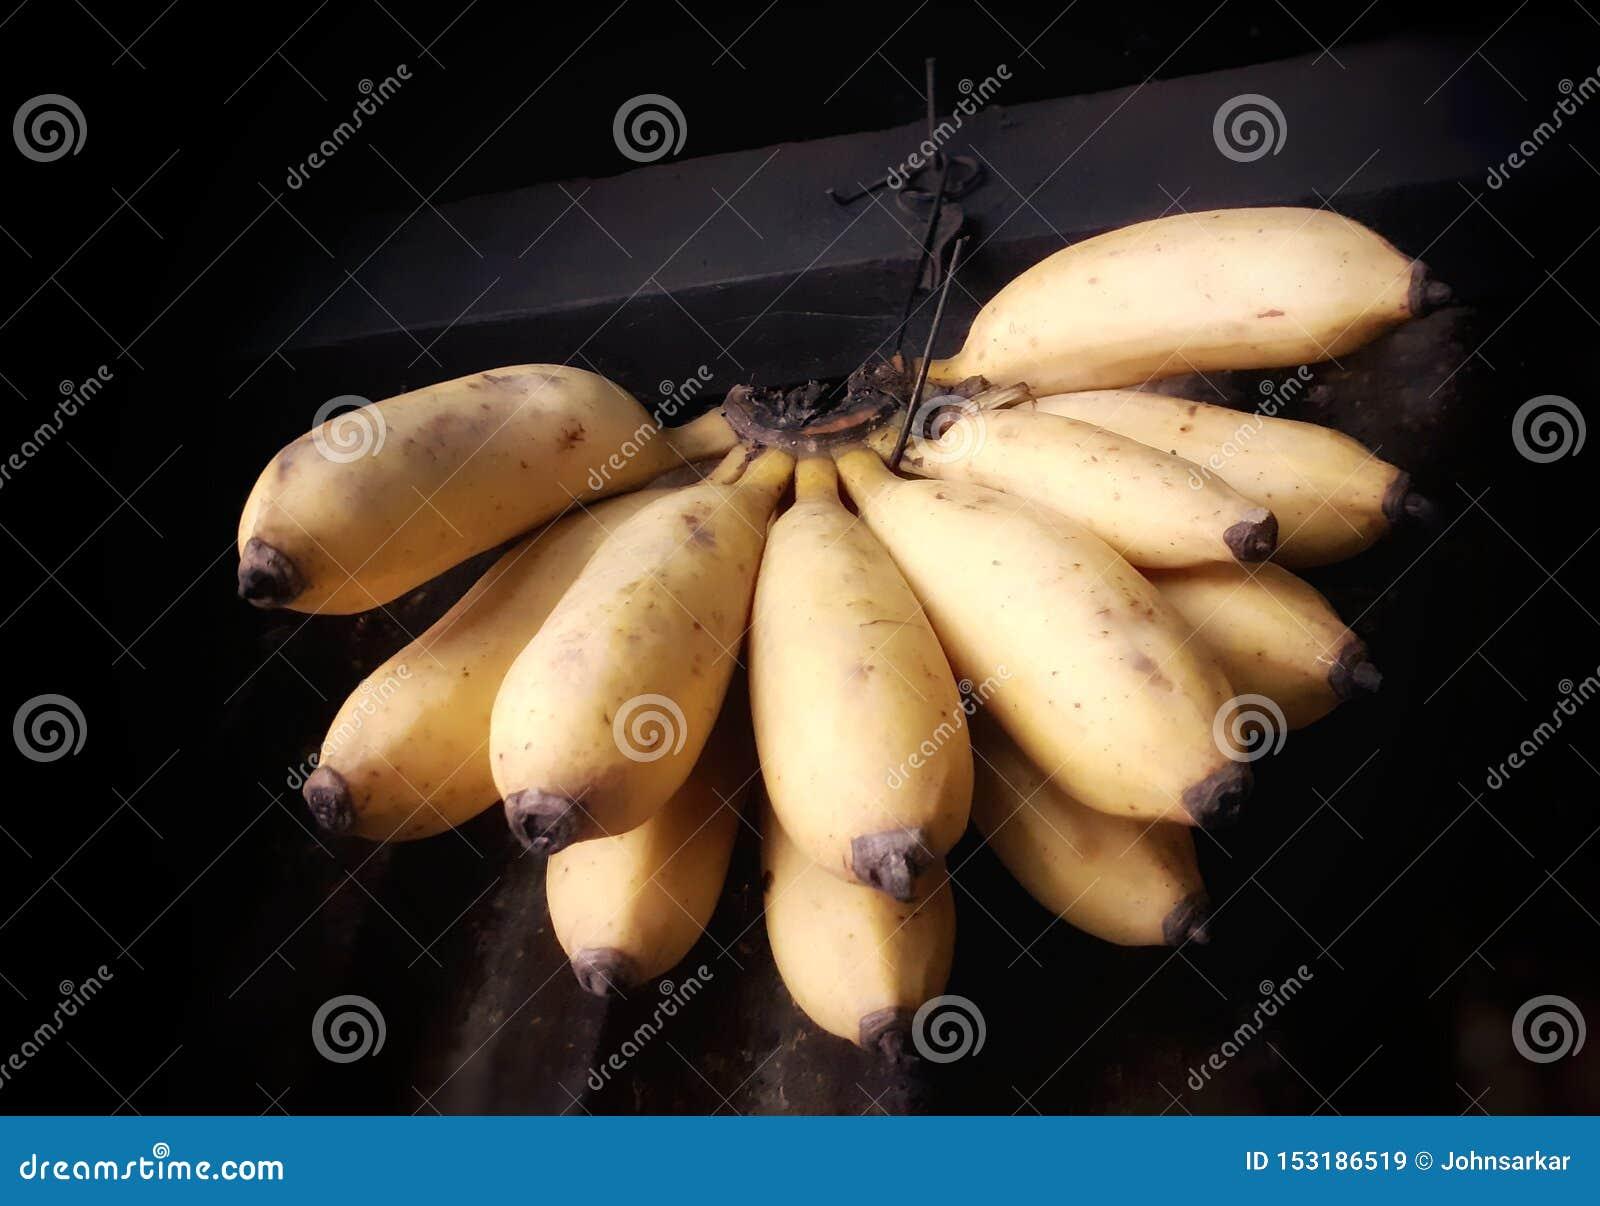 Ripe yellow bananas hanging inside a shop